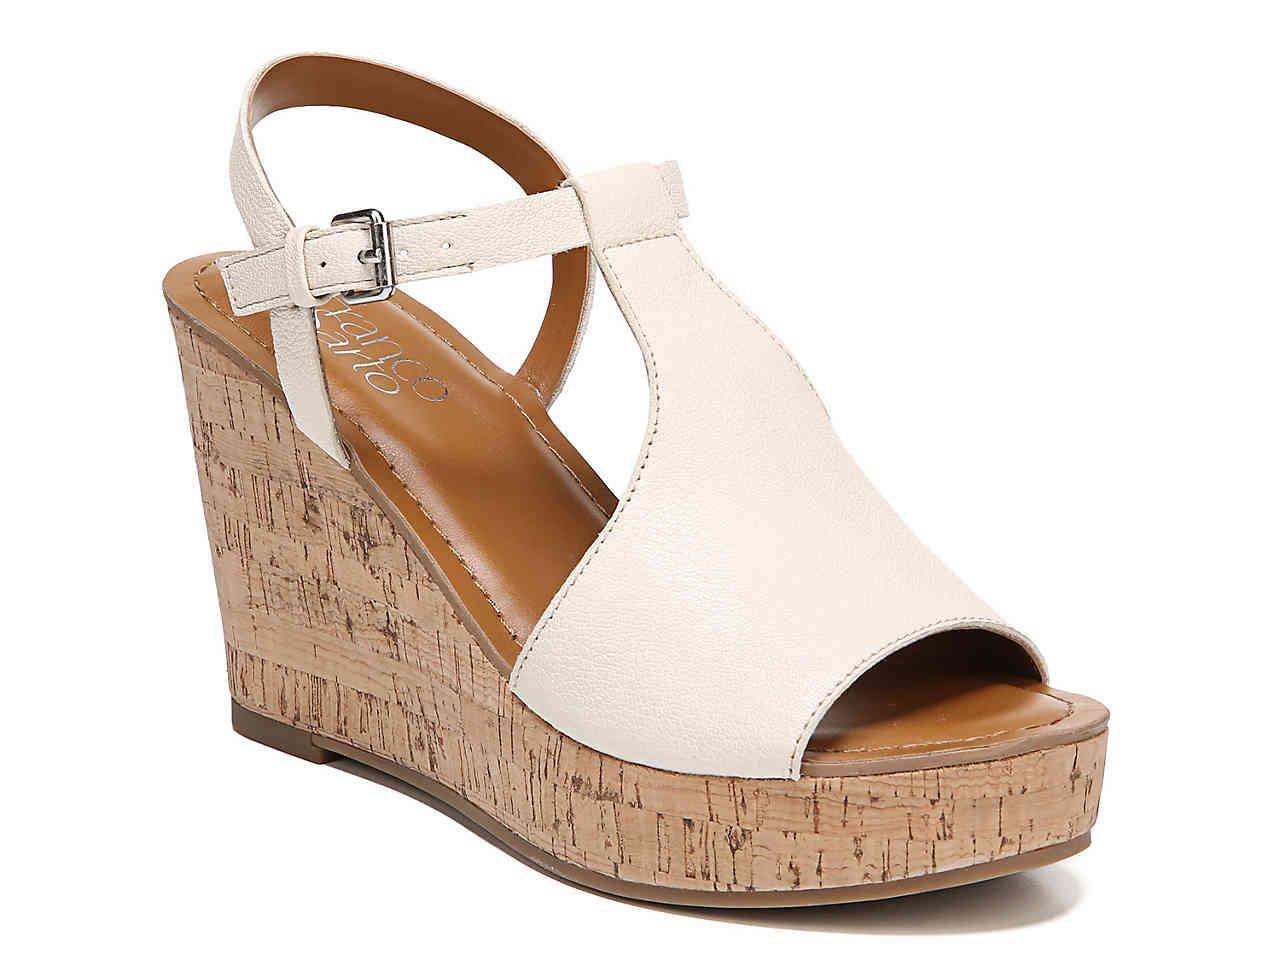 04fc0085b2ec Lyst - Franco Sarto Clinton Wedge Sandal in White